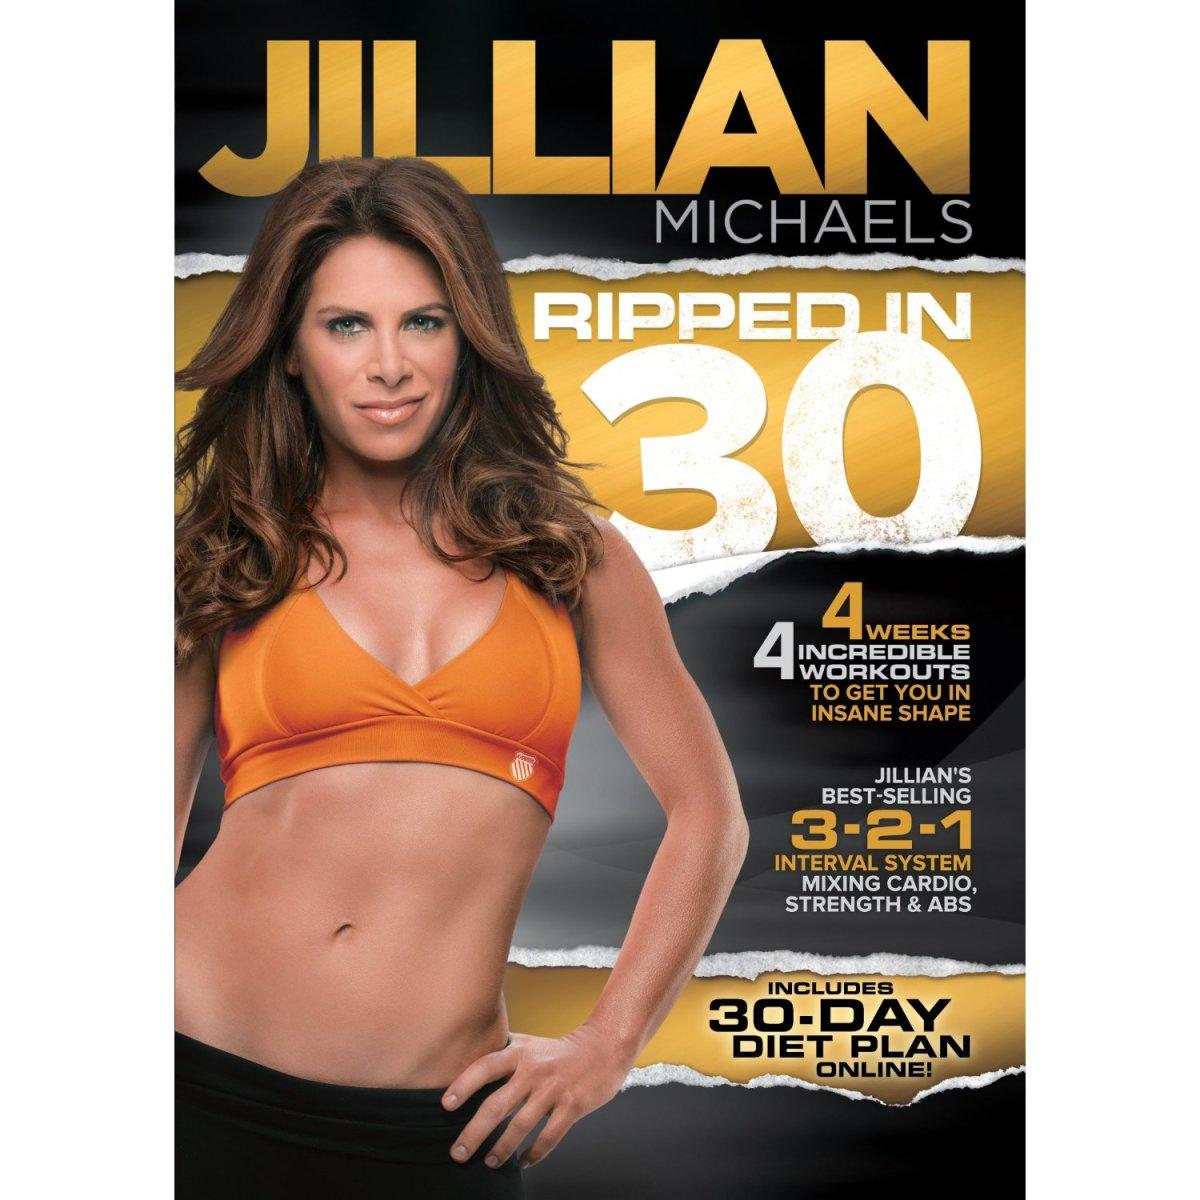 review-of-jillian-michaels-ripped-in-30-dvd